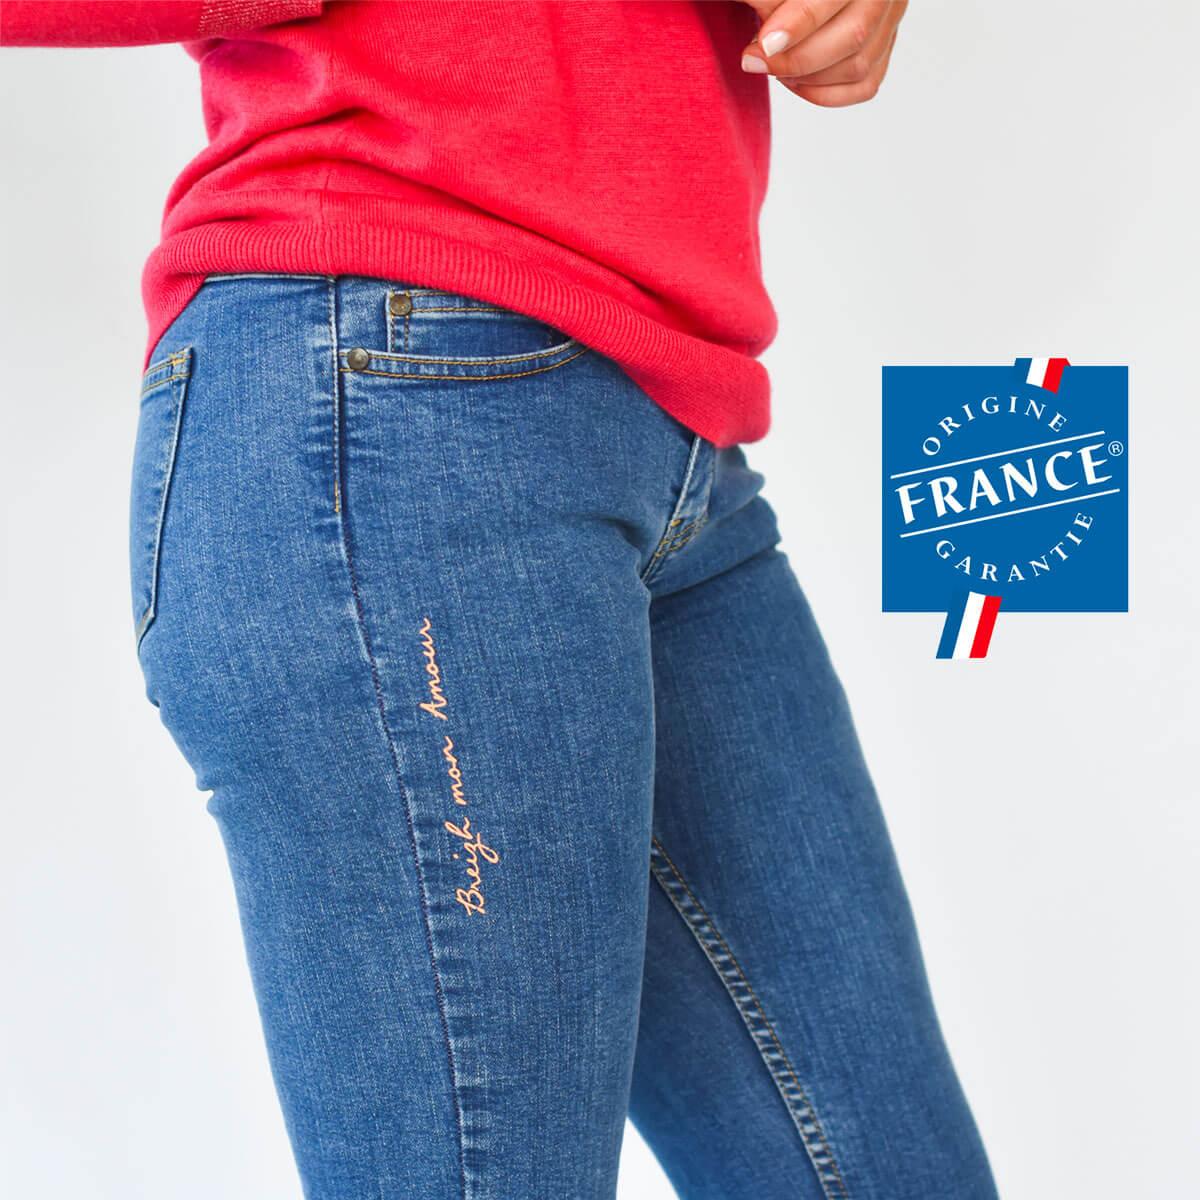 Jean fabriqué en France Perros-Guirec